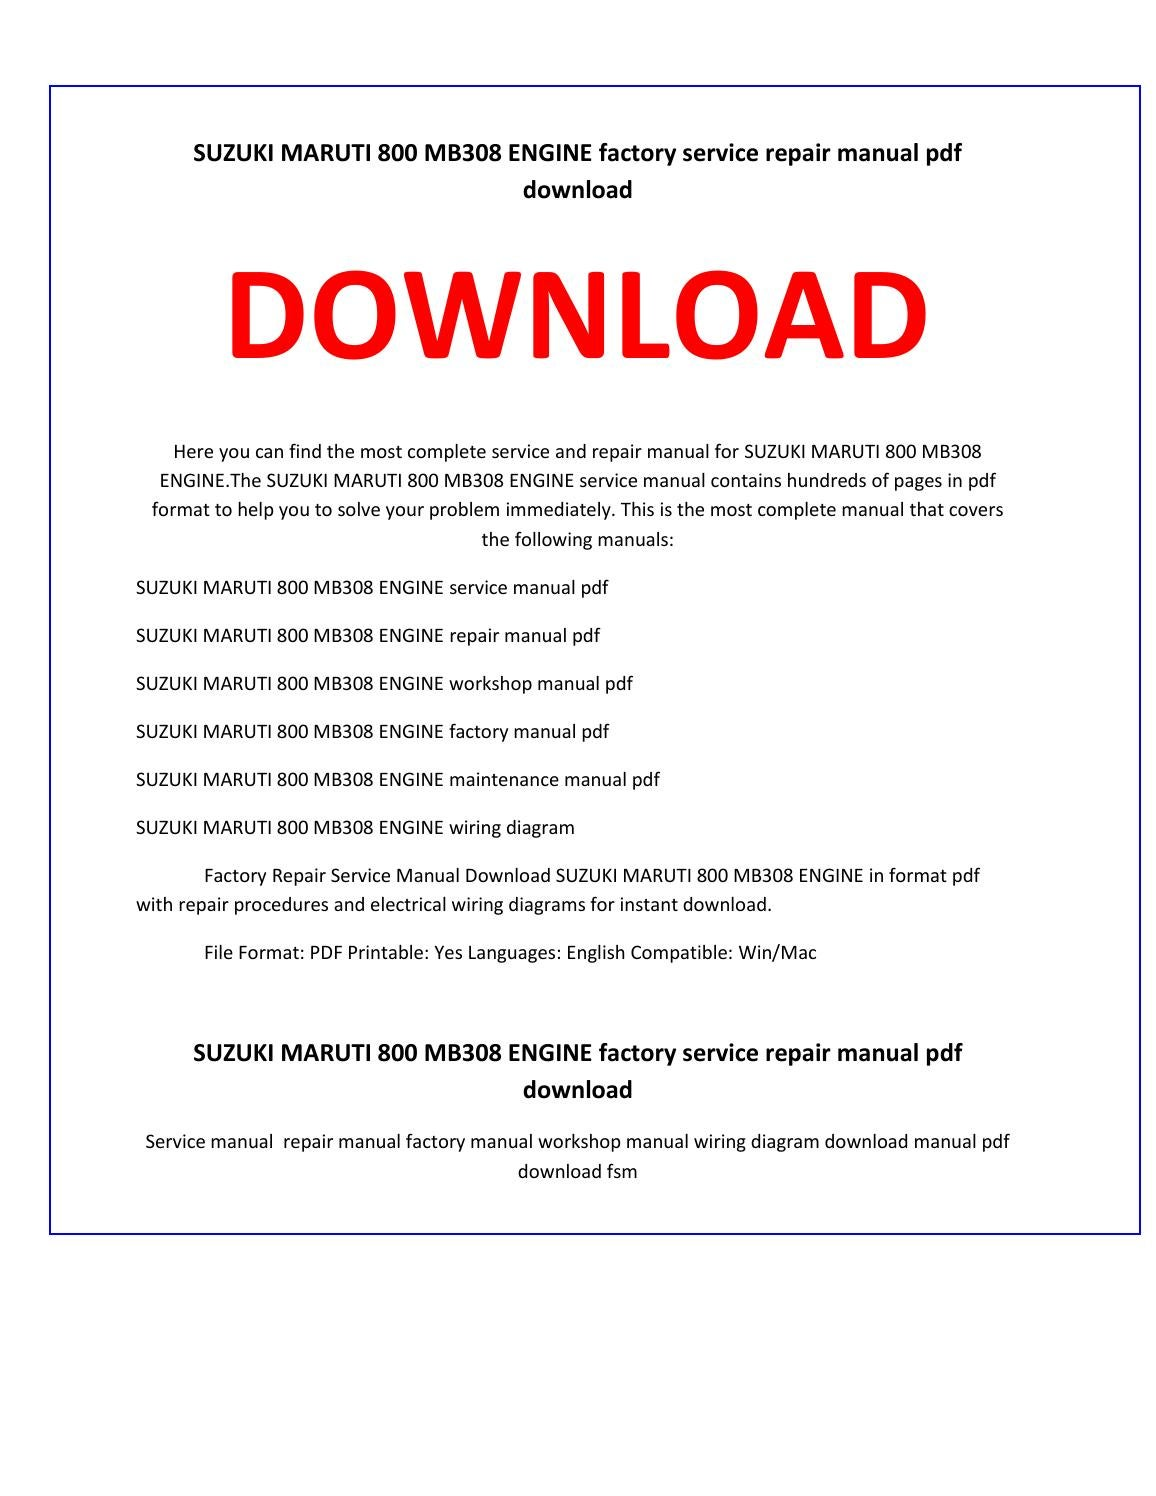 Maruti alto 800 repair manual ebook array best free fillable forms free repair manual pdf free fillable forms rh lifechallengingrides us fandeluxe Choice Image